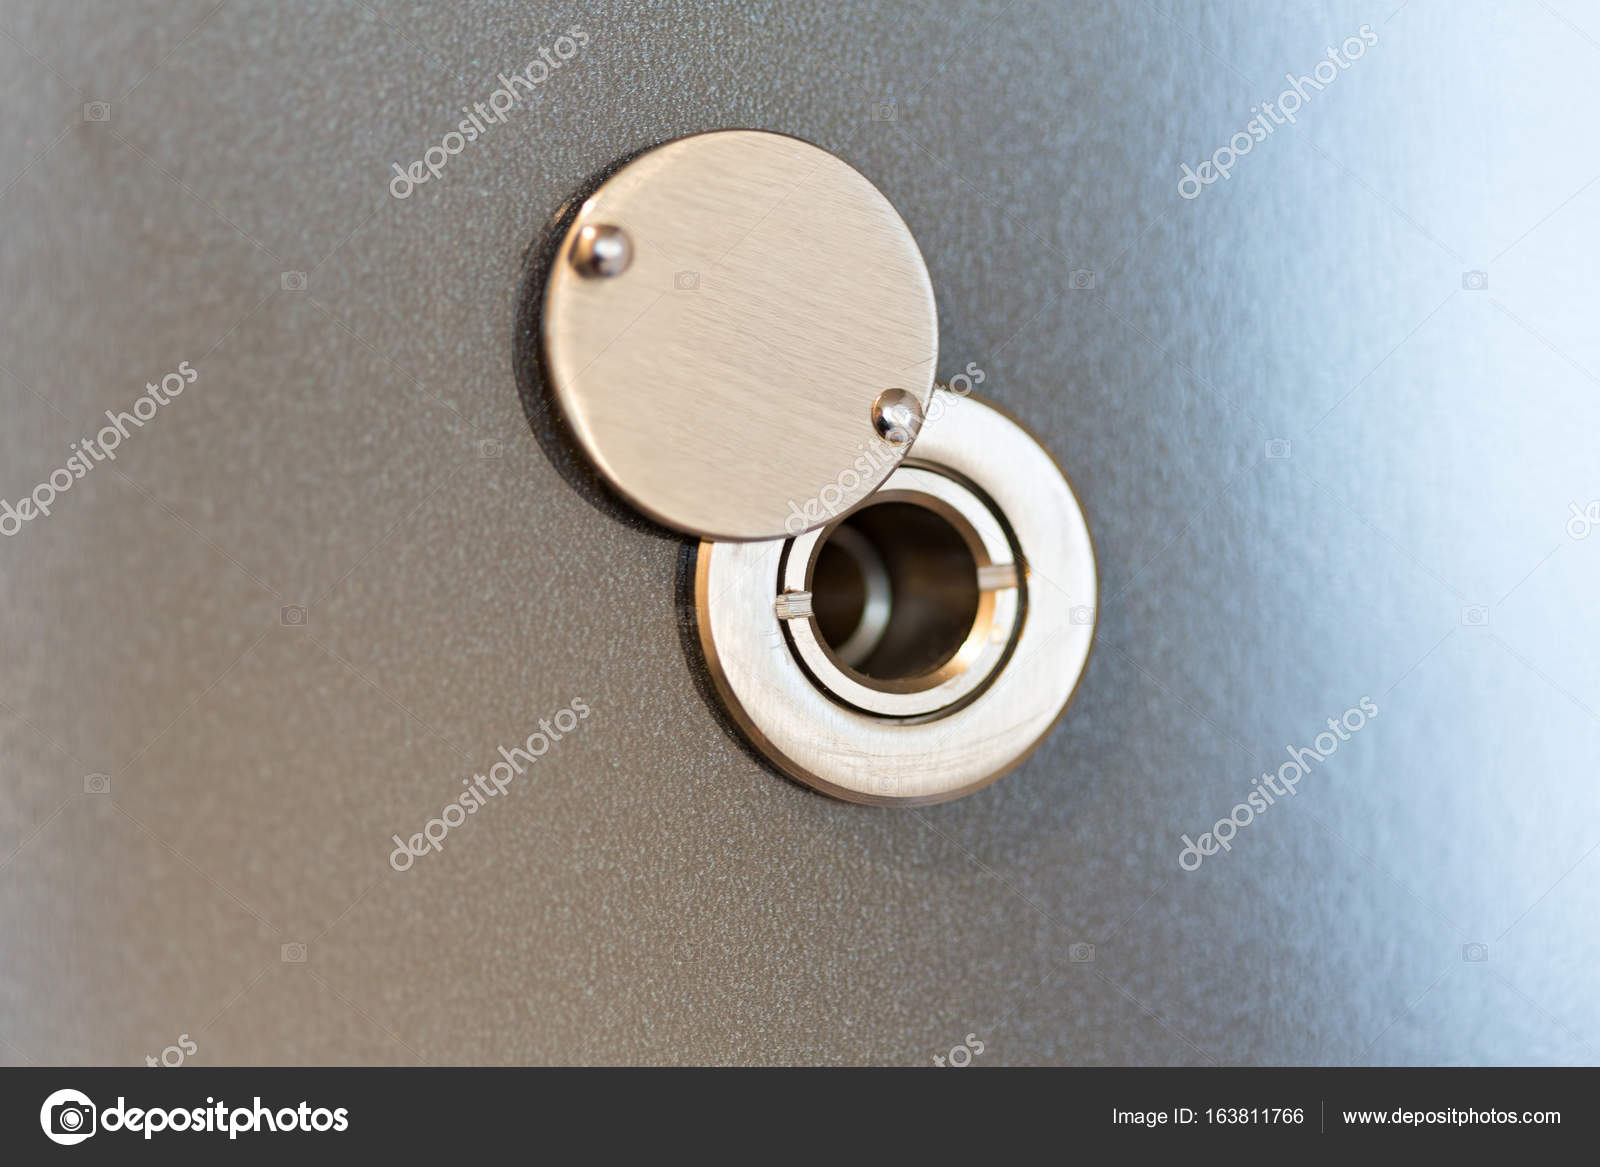 Peepholespy door hole \u2014 Stock Photo & Peepholespy door hole \u2014 Stock Photo © rilueda #163811766